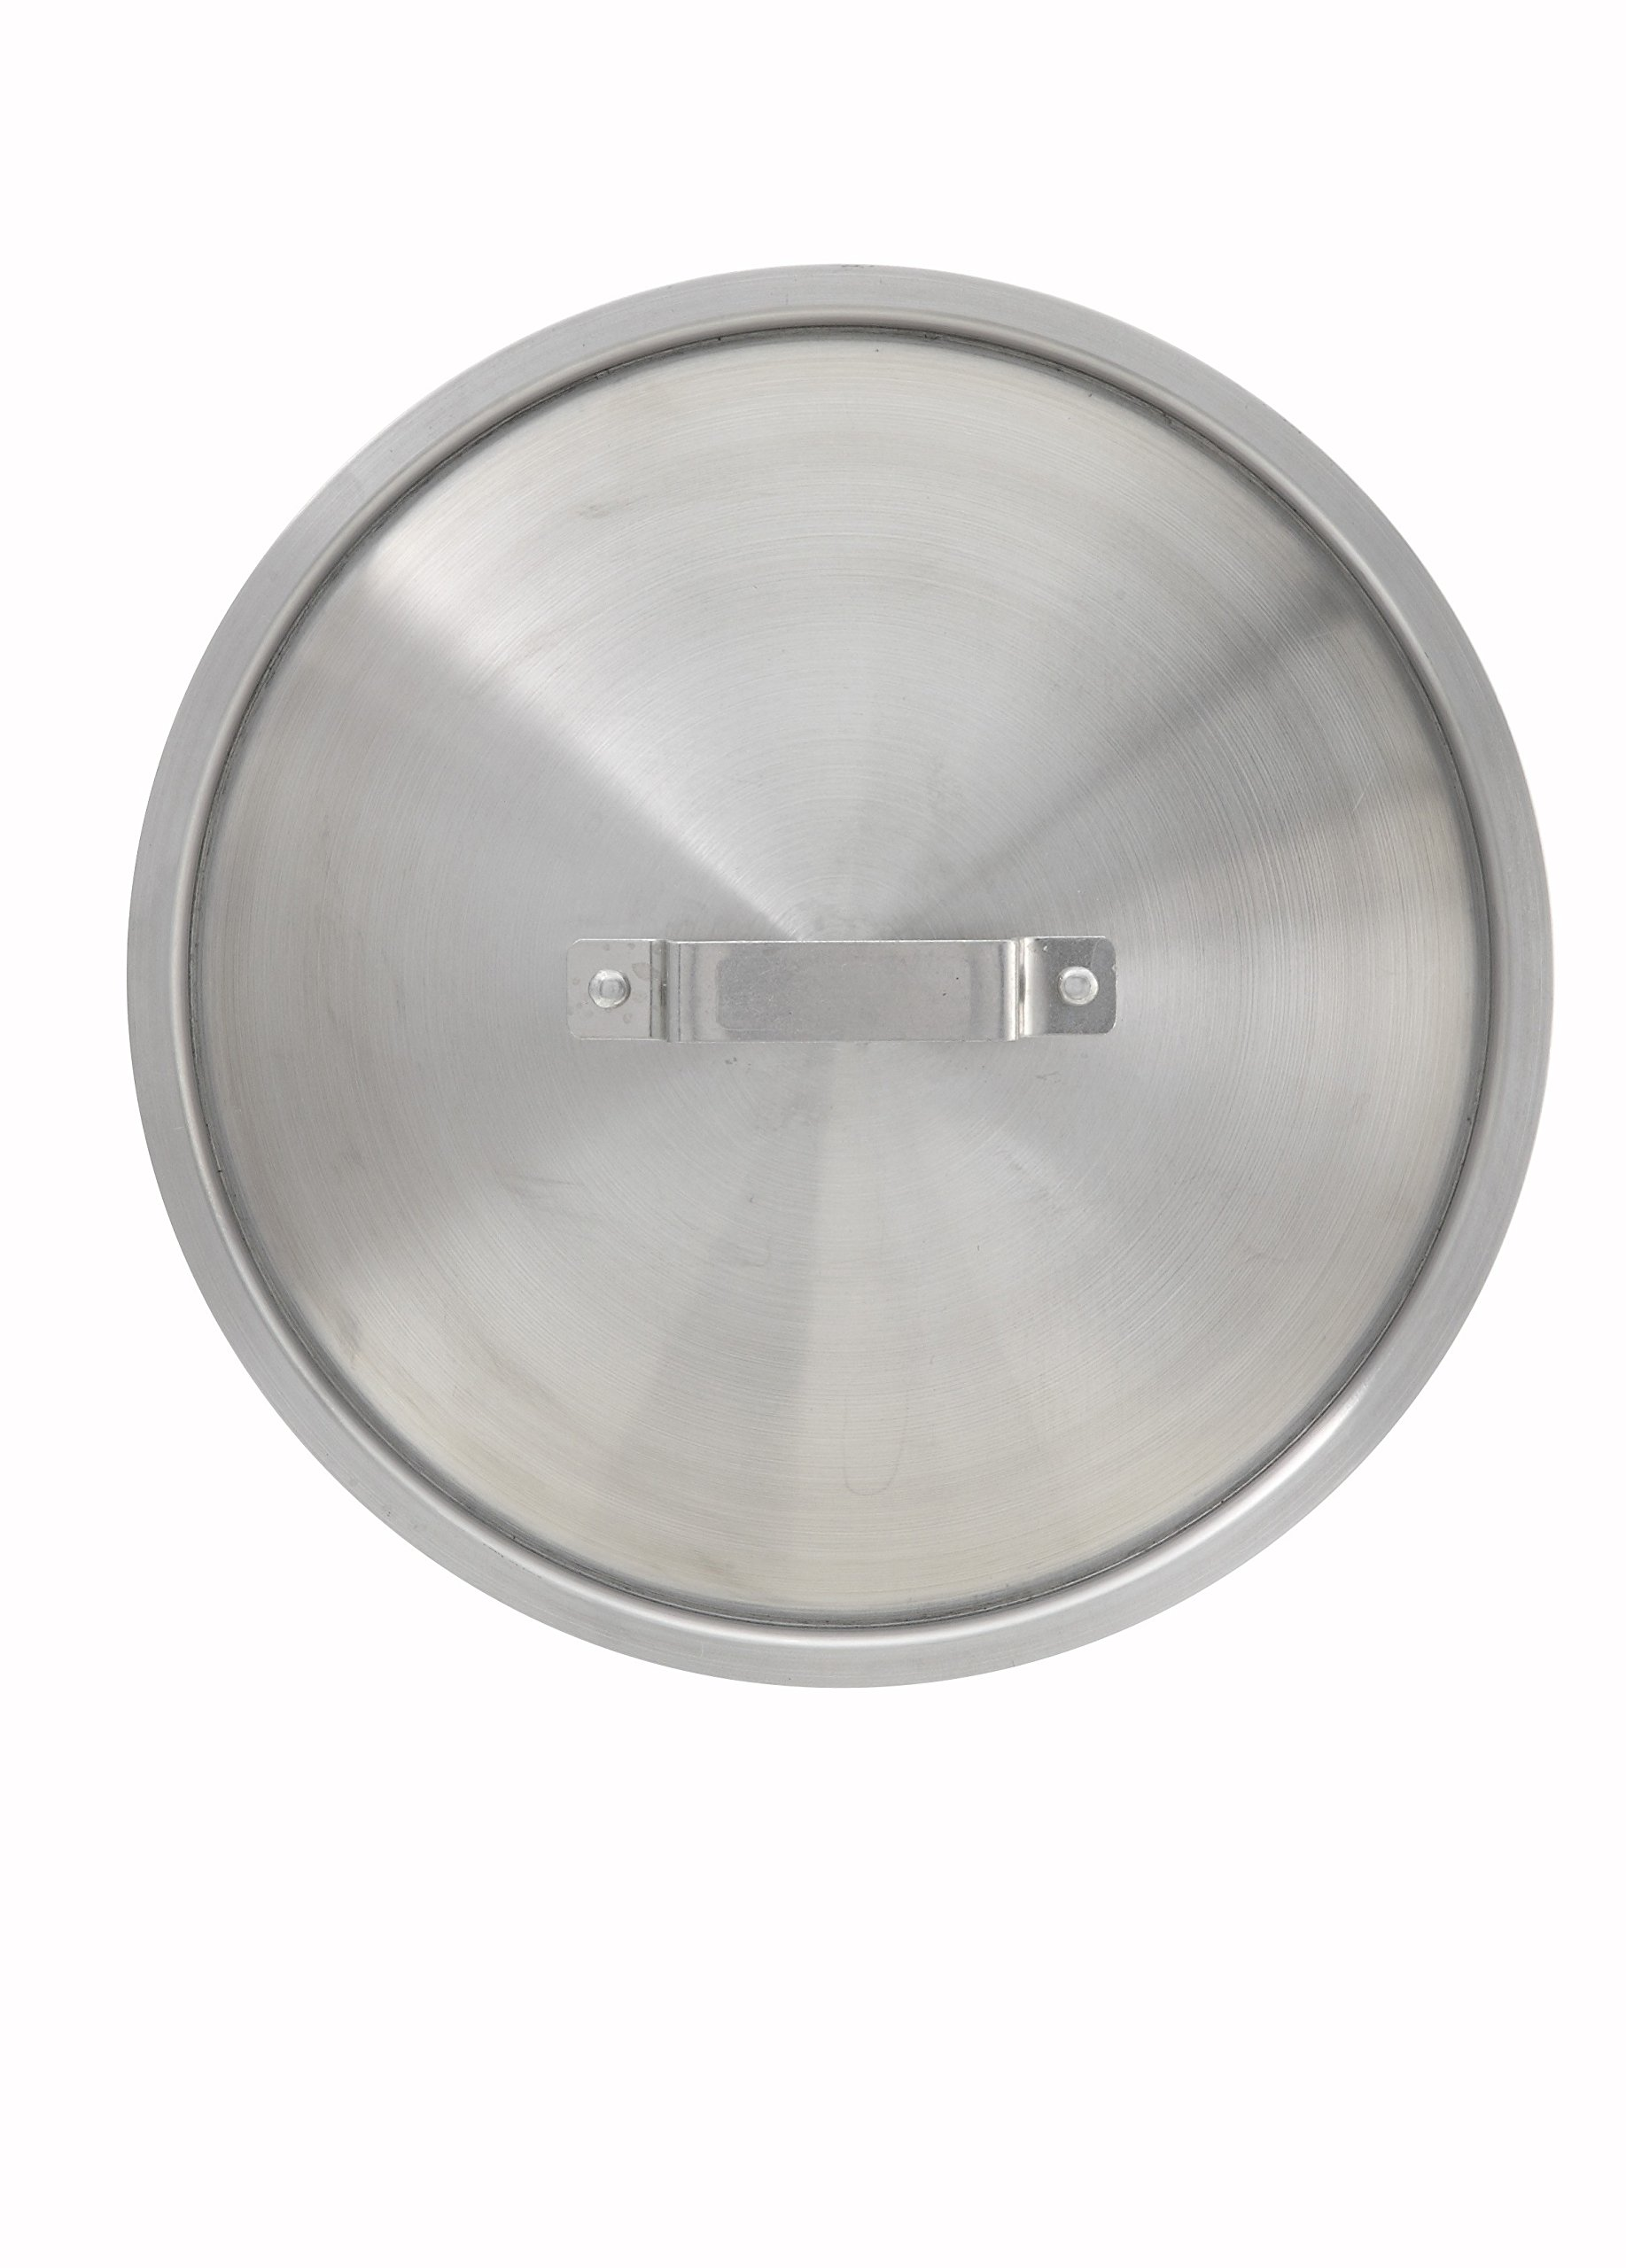 Winco AXS-32c Stock Pot Cover, 20/24-Quart